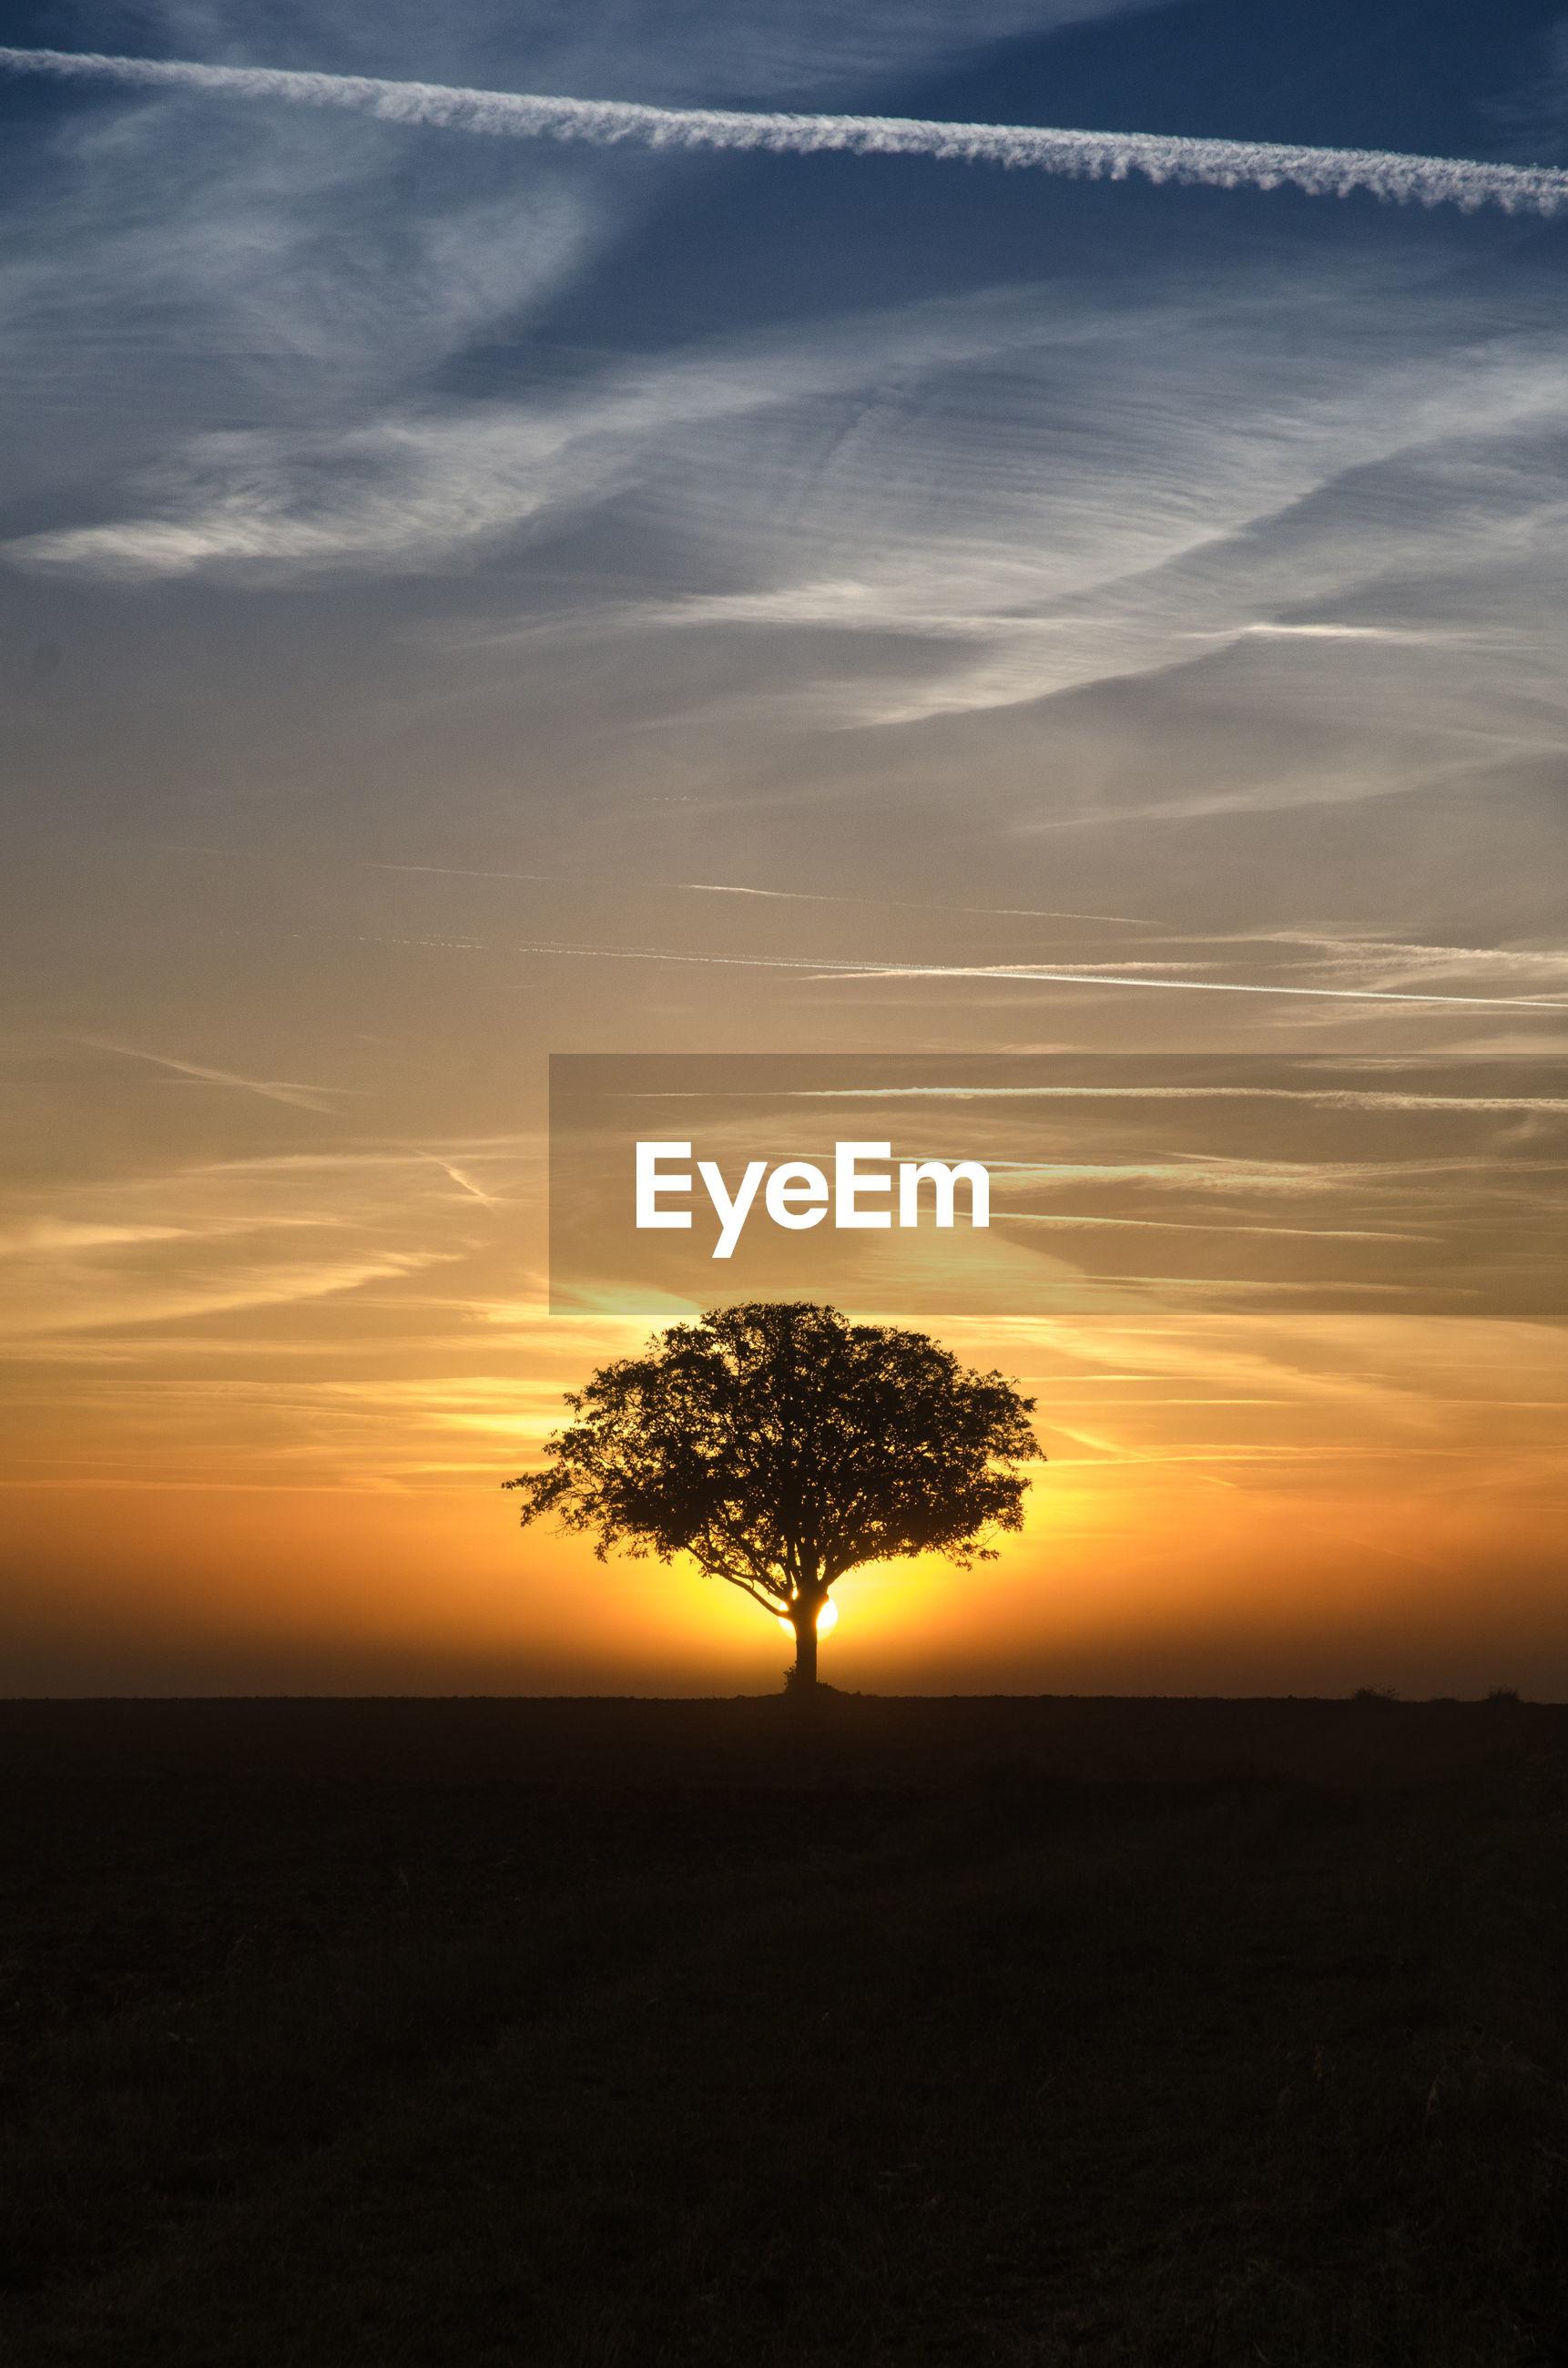 SILHOUETTE TREE ON LANDSCAPE AGAINST SUNSET